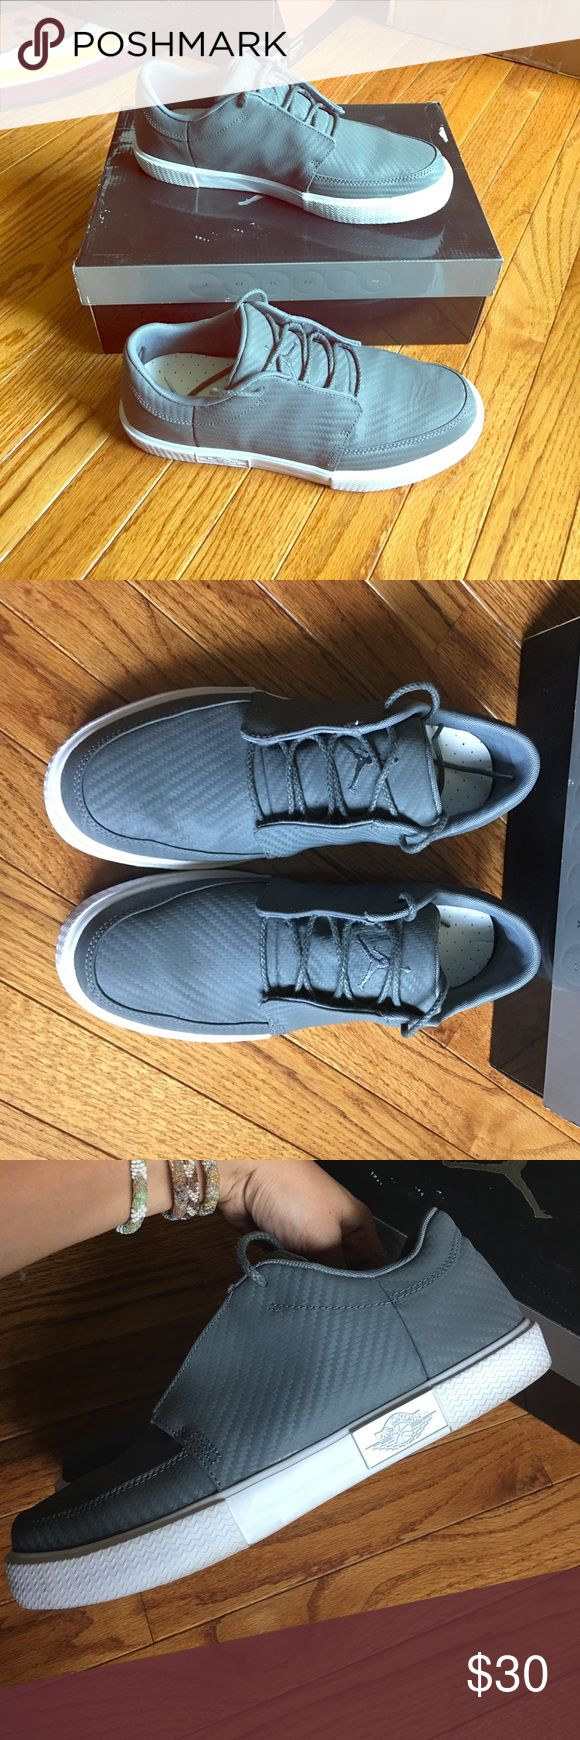 Jordan V.5 grown low Cool grey/ cool Grey white Jordan Shoes Sneakers